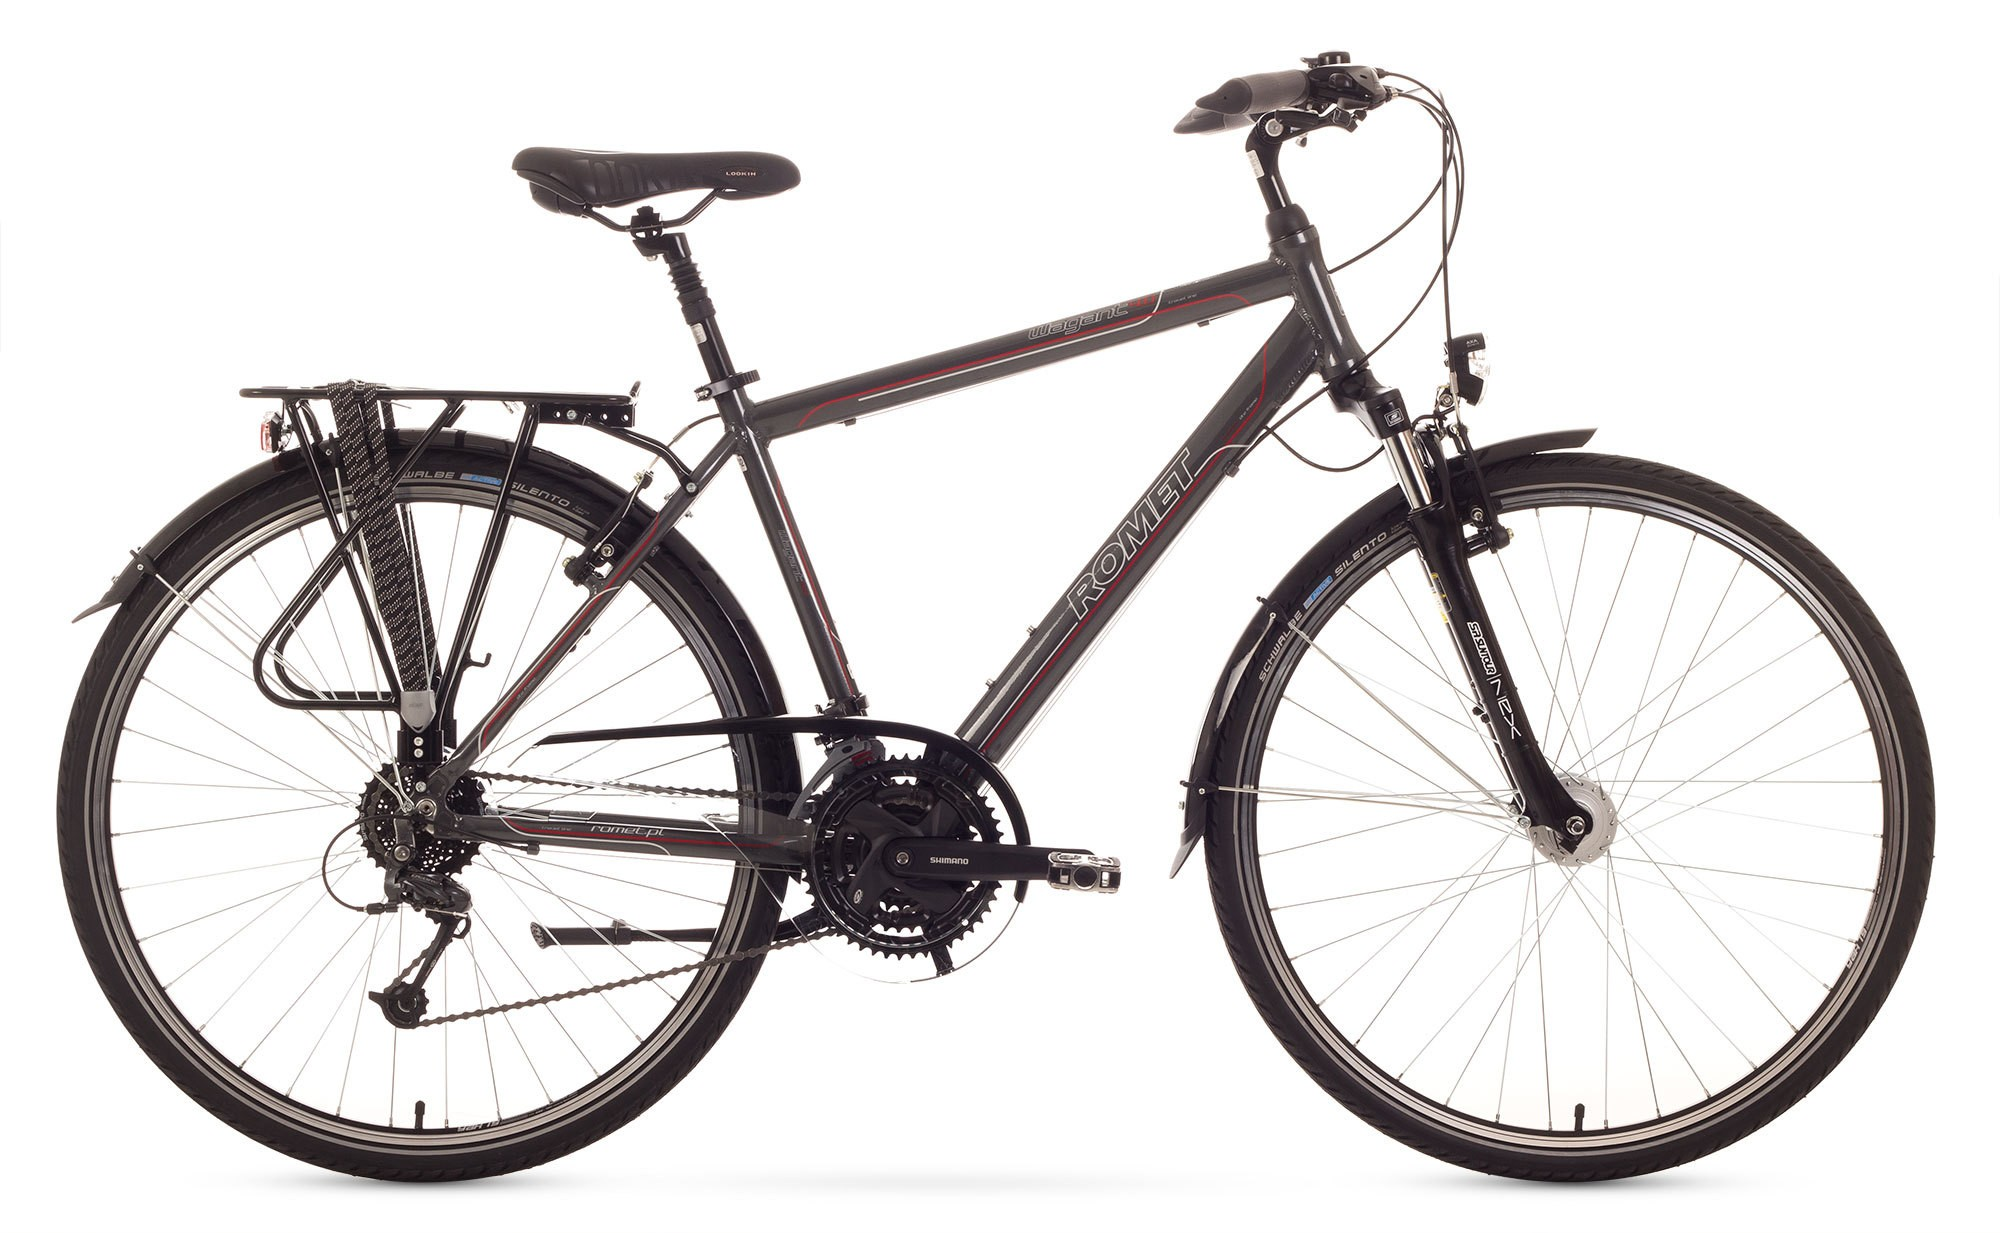 Bicicleta Trekking Romet Wagant 4.0 - grafit